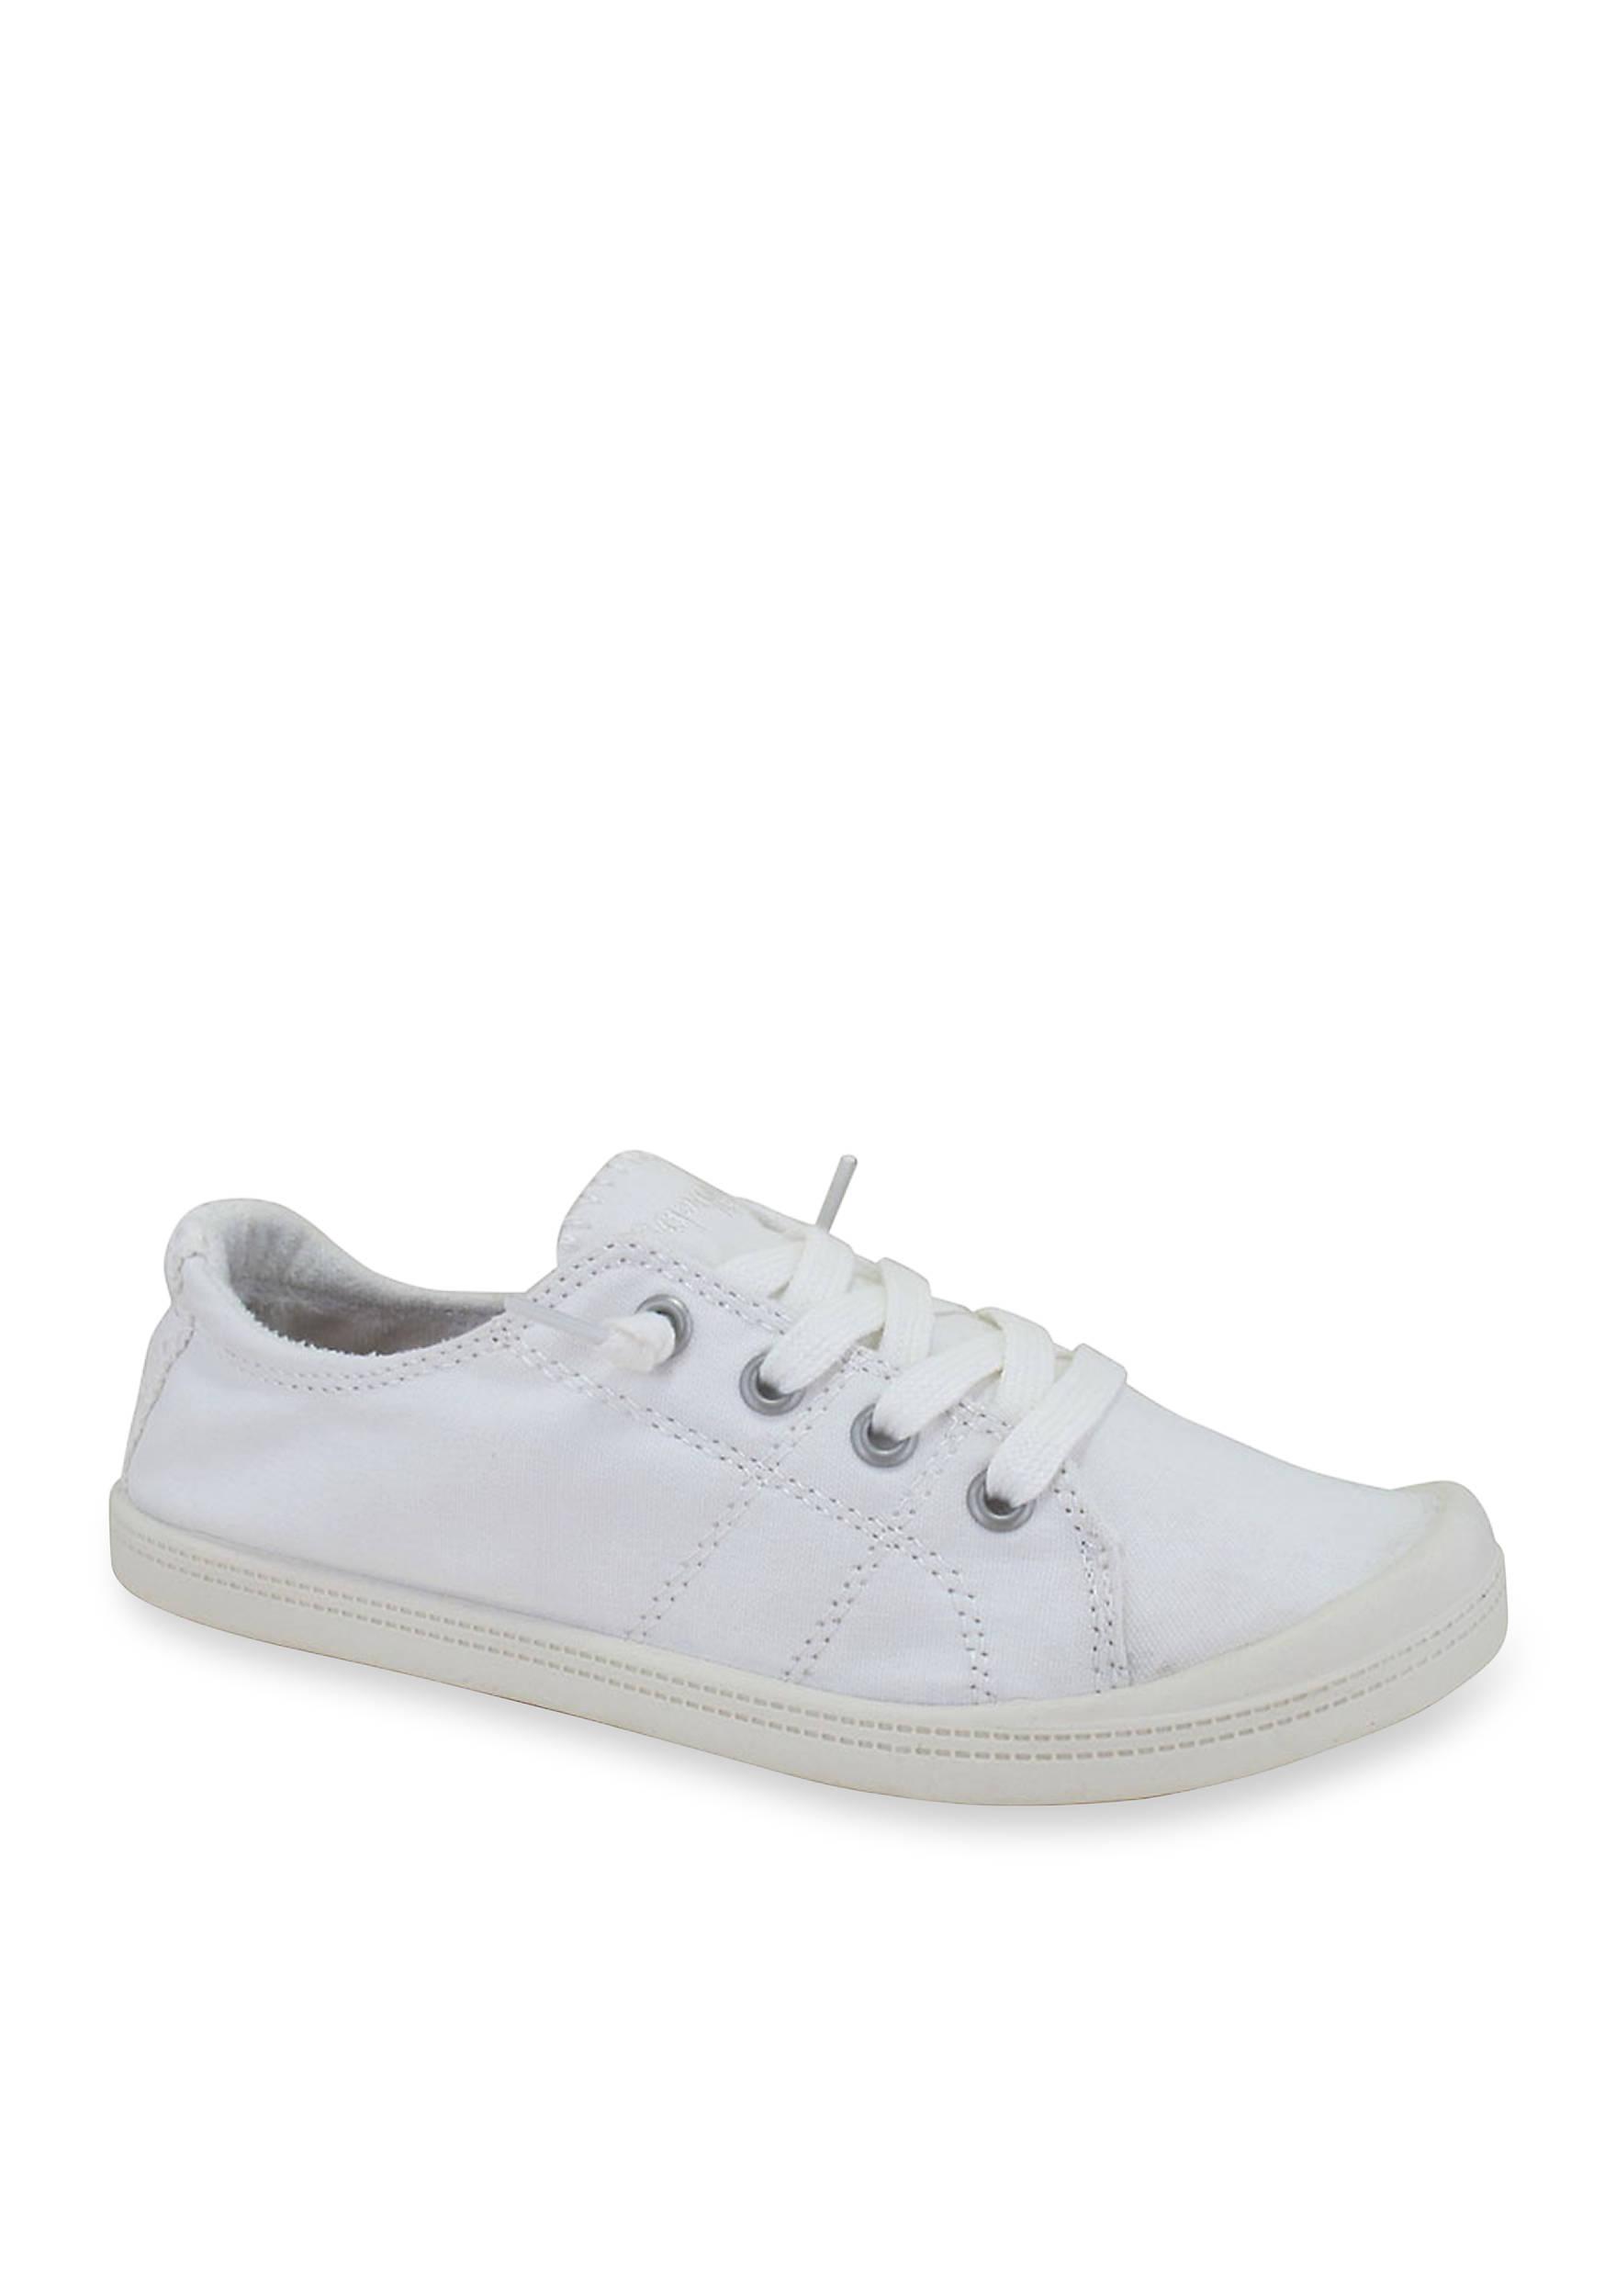 Mens Belk Shoes